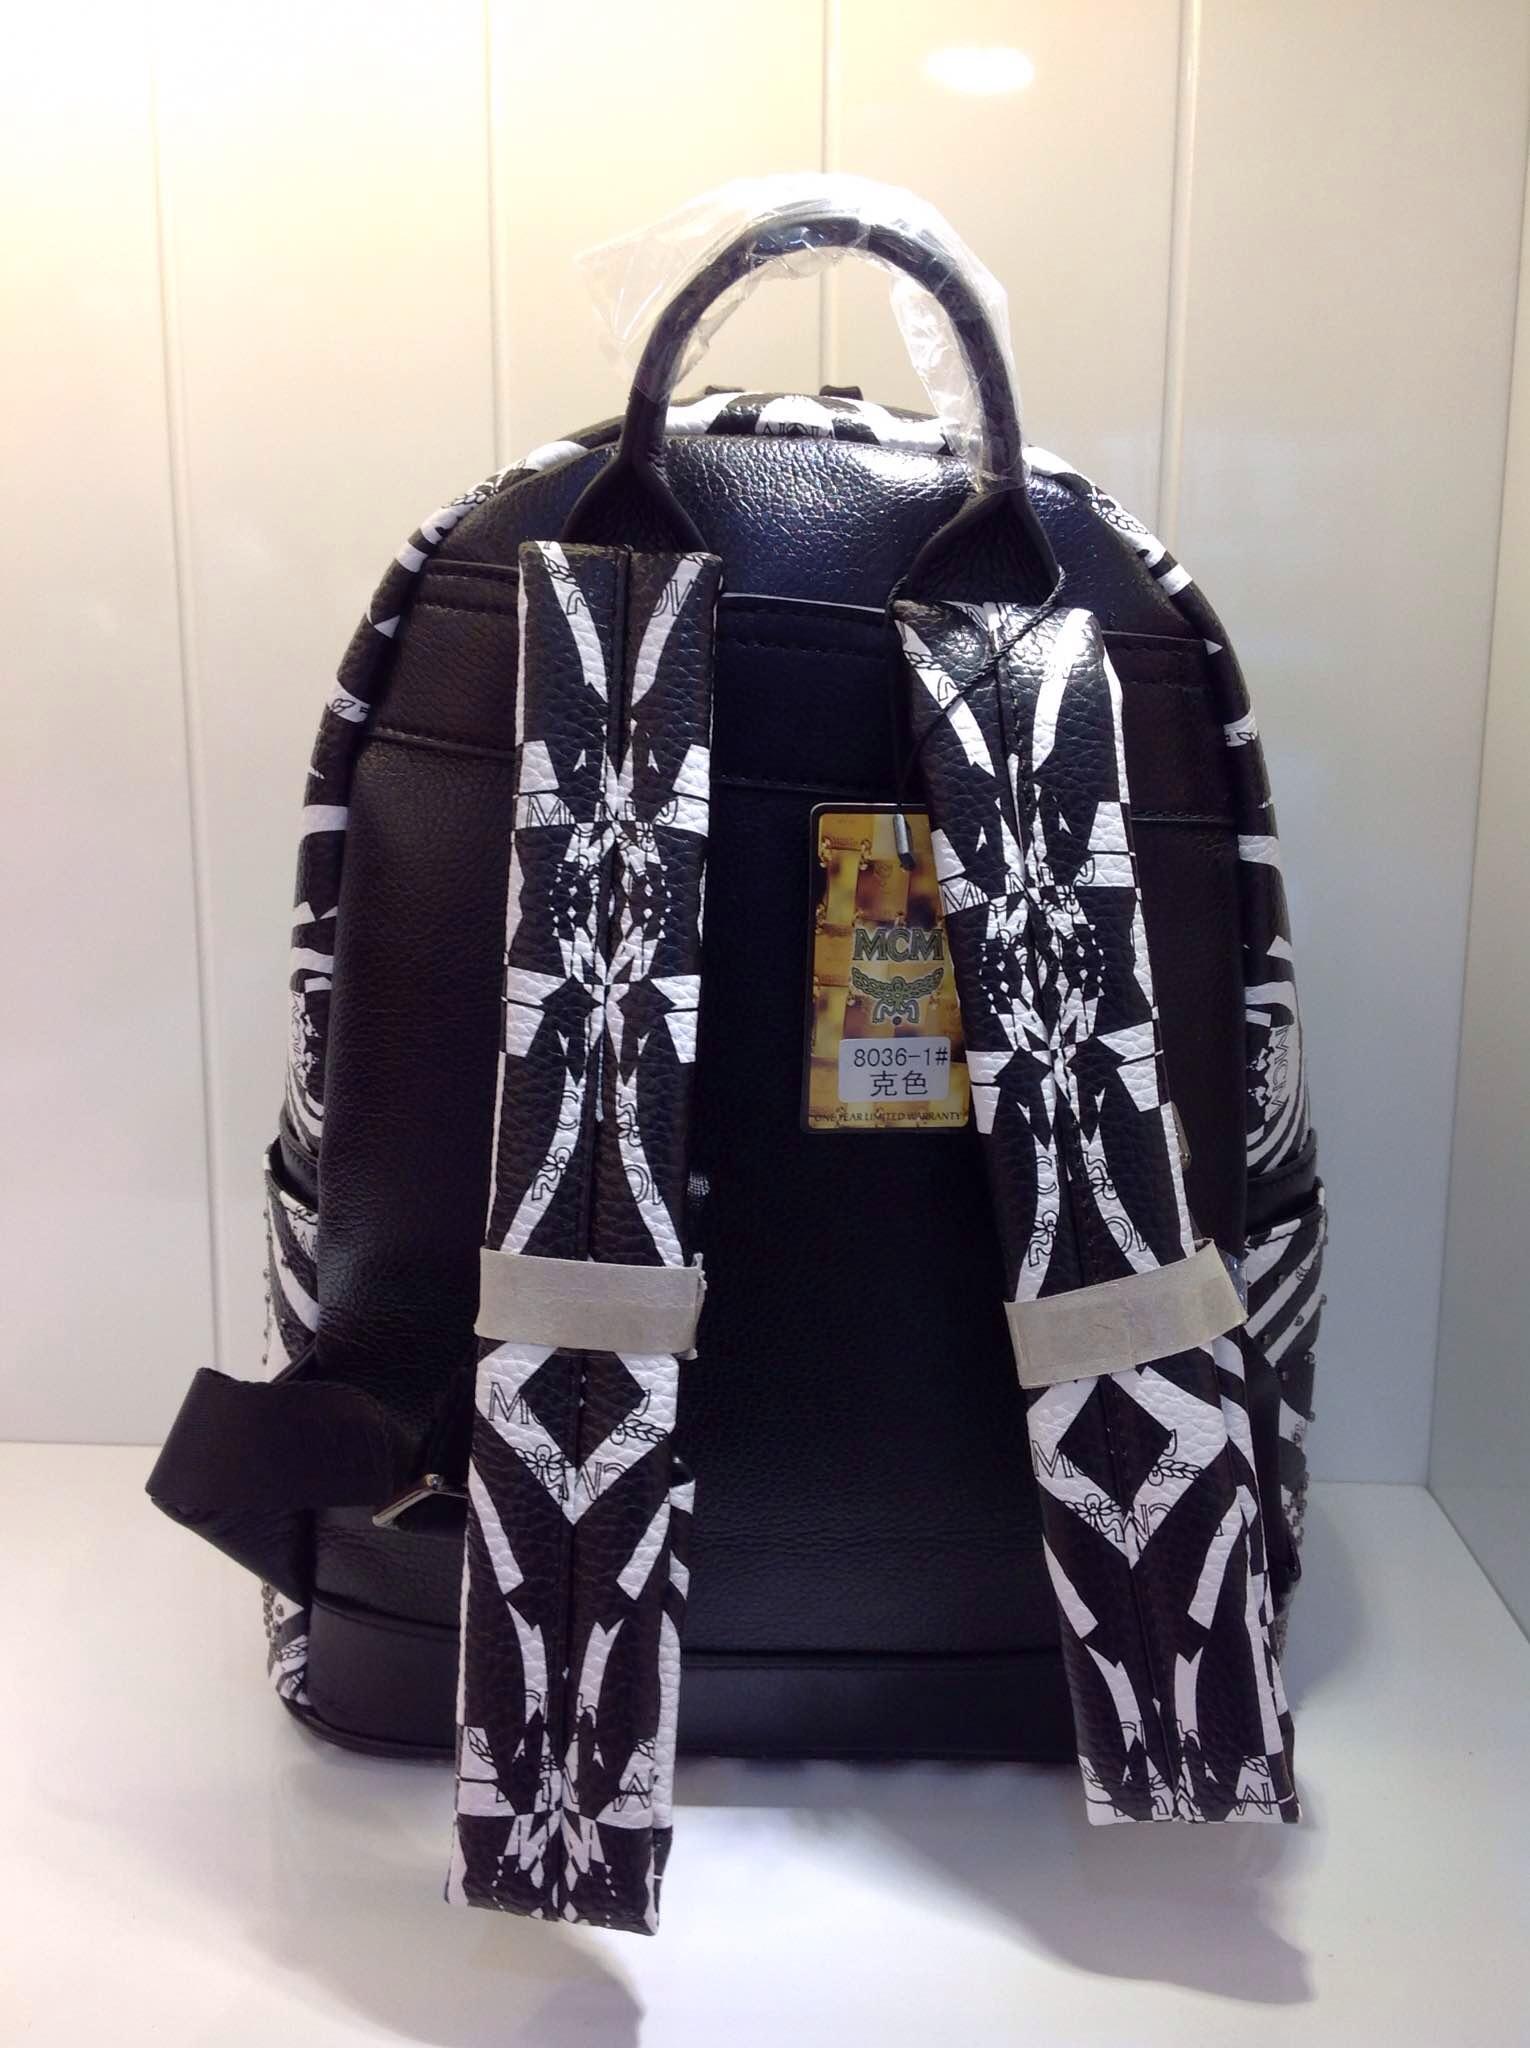 MCM中号斑马包 时尚潮流 欧美大牌明星款